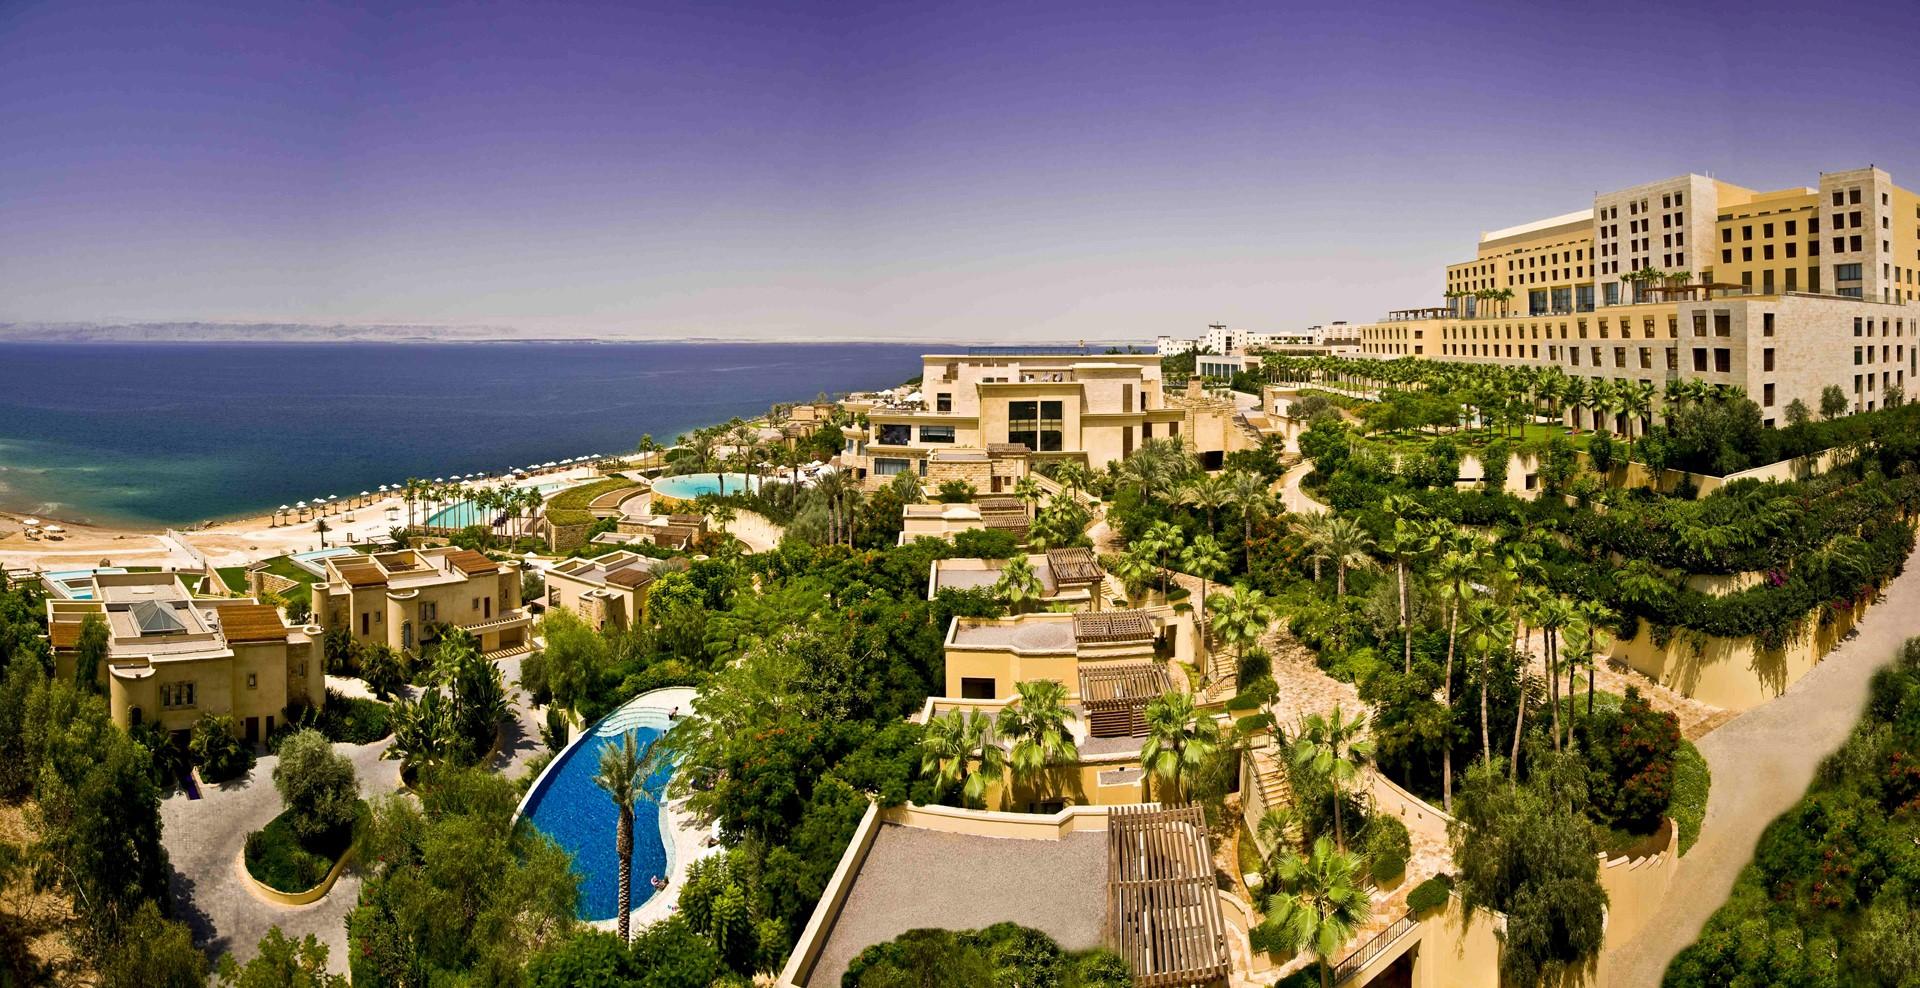 Hotel Kempinsky Ishtar 5* - Mar Morto